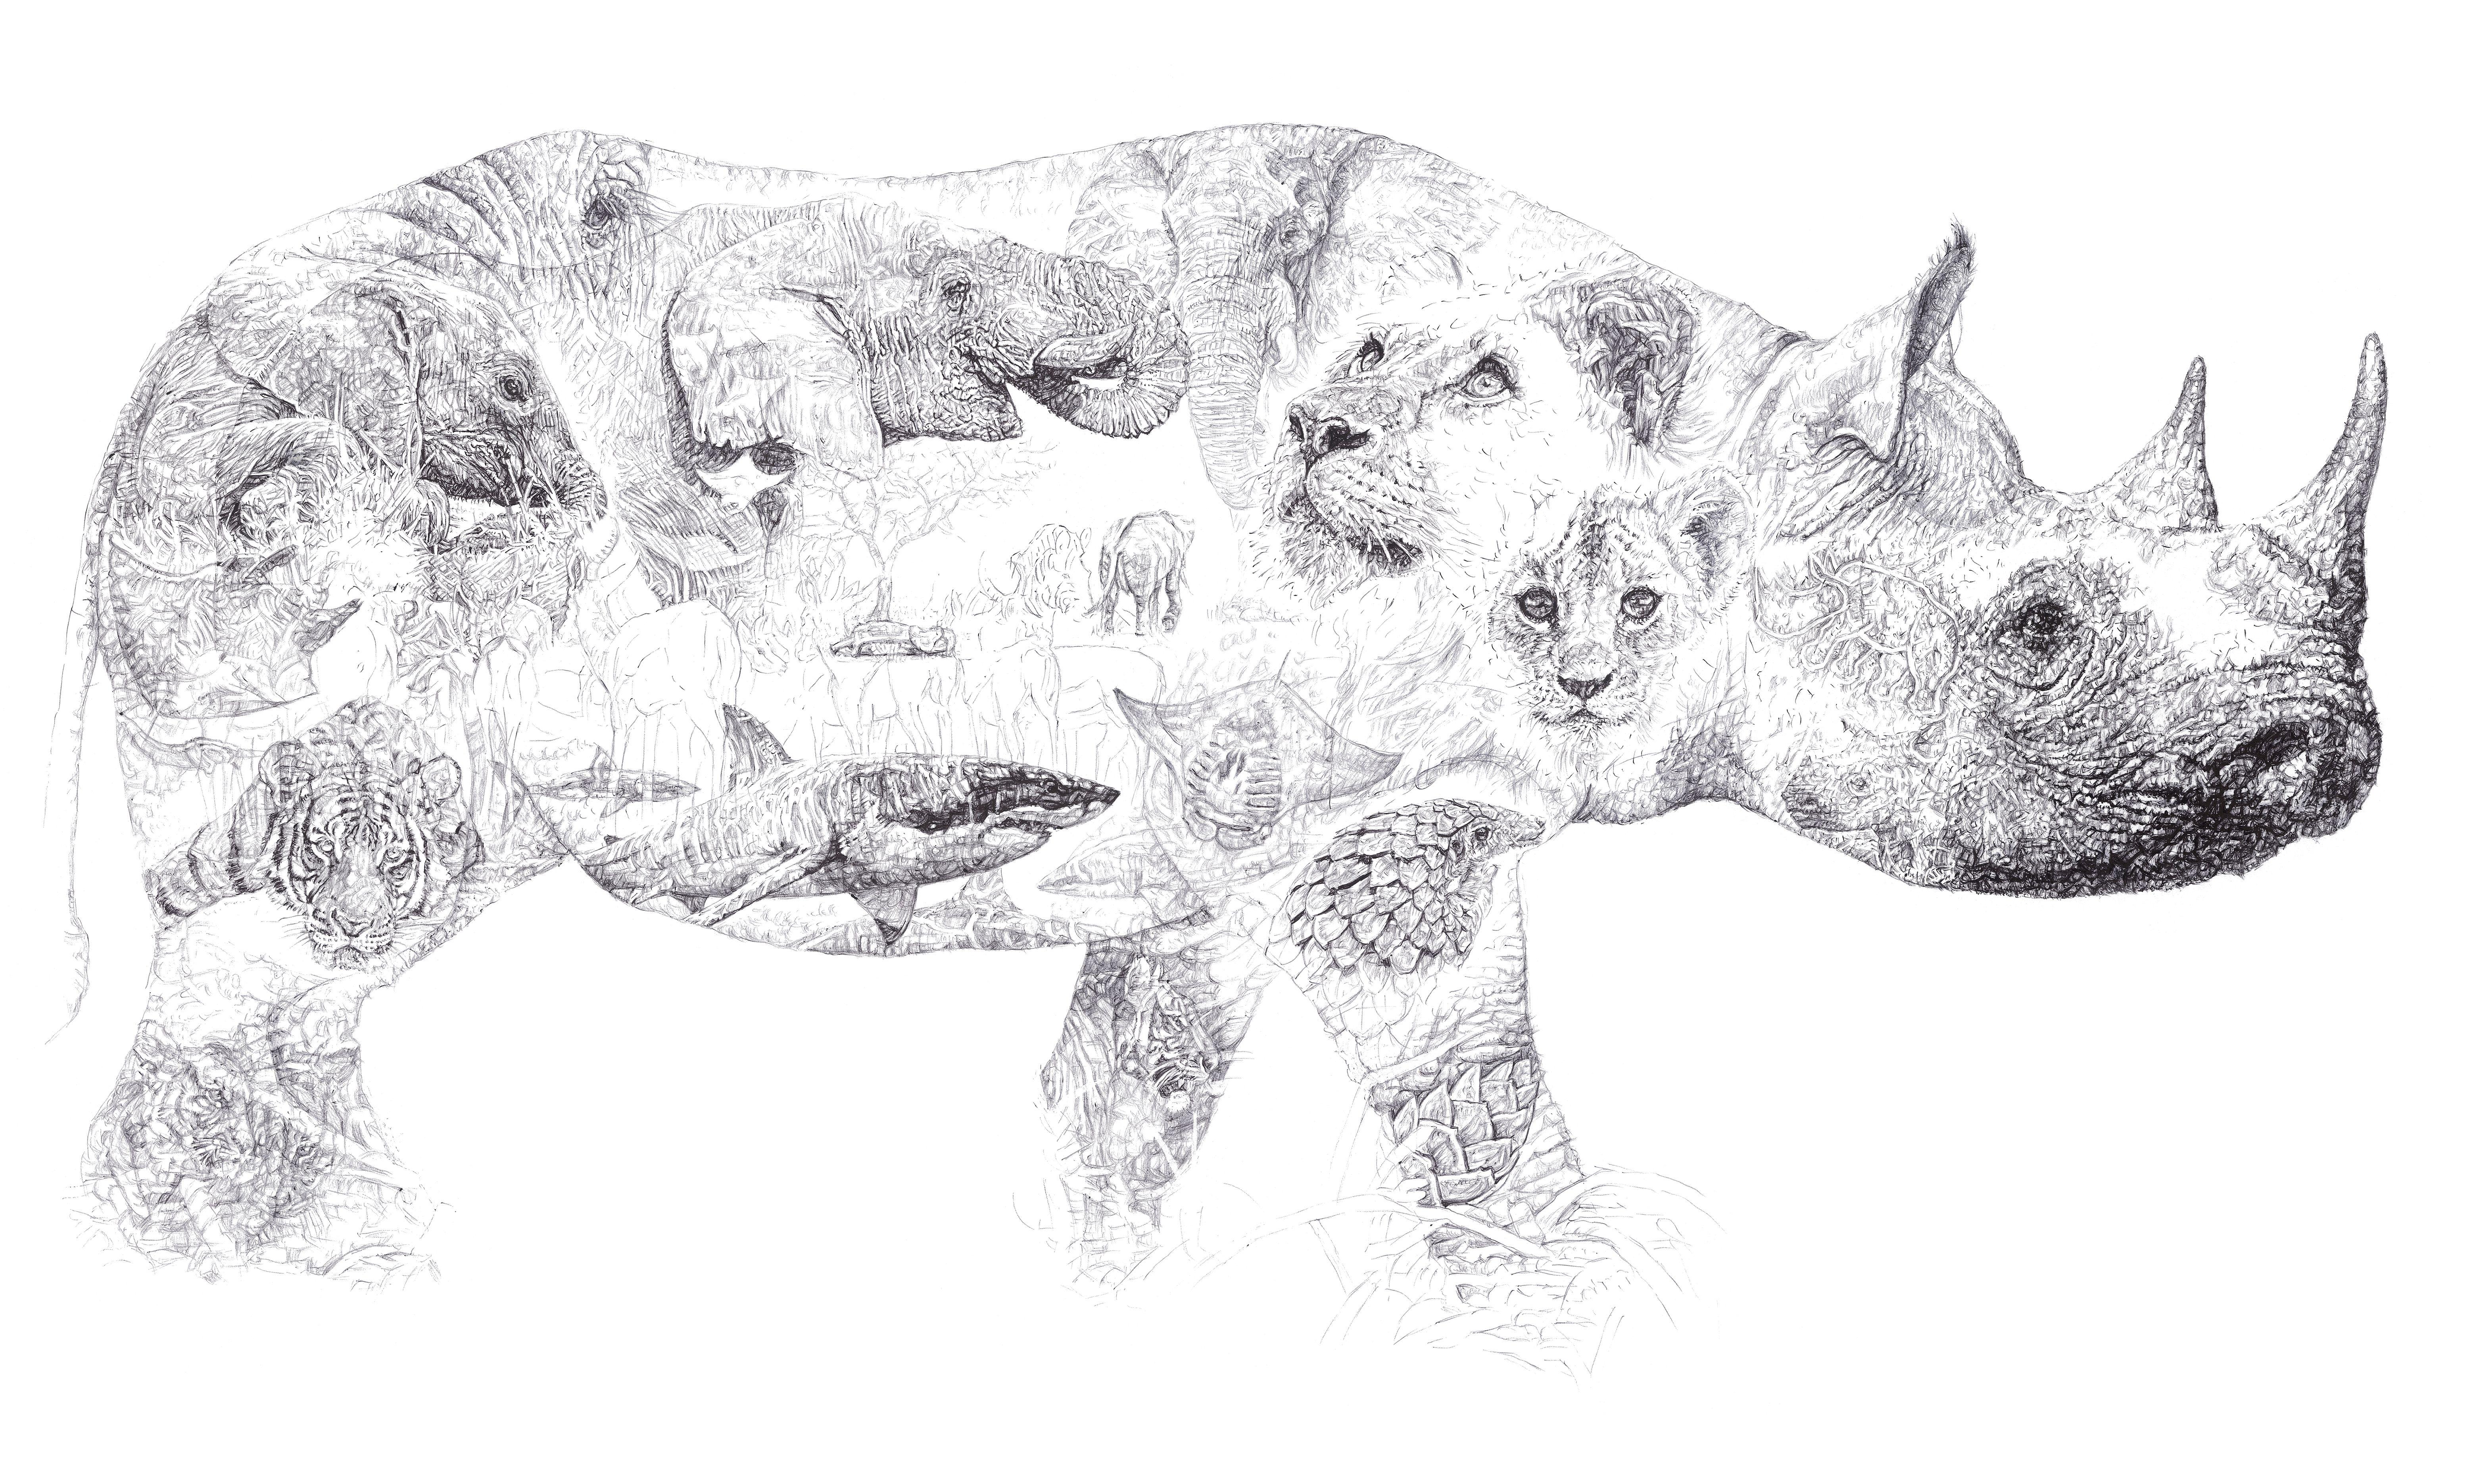 Drawn rhino african animal In Lee Attenborough McCracken 'Africa'